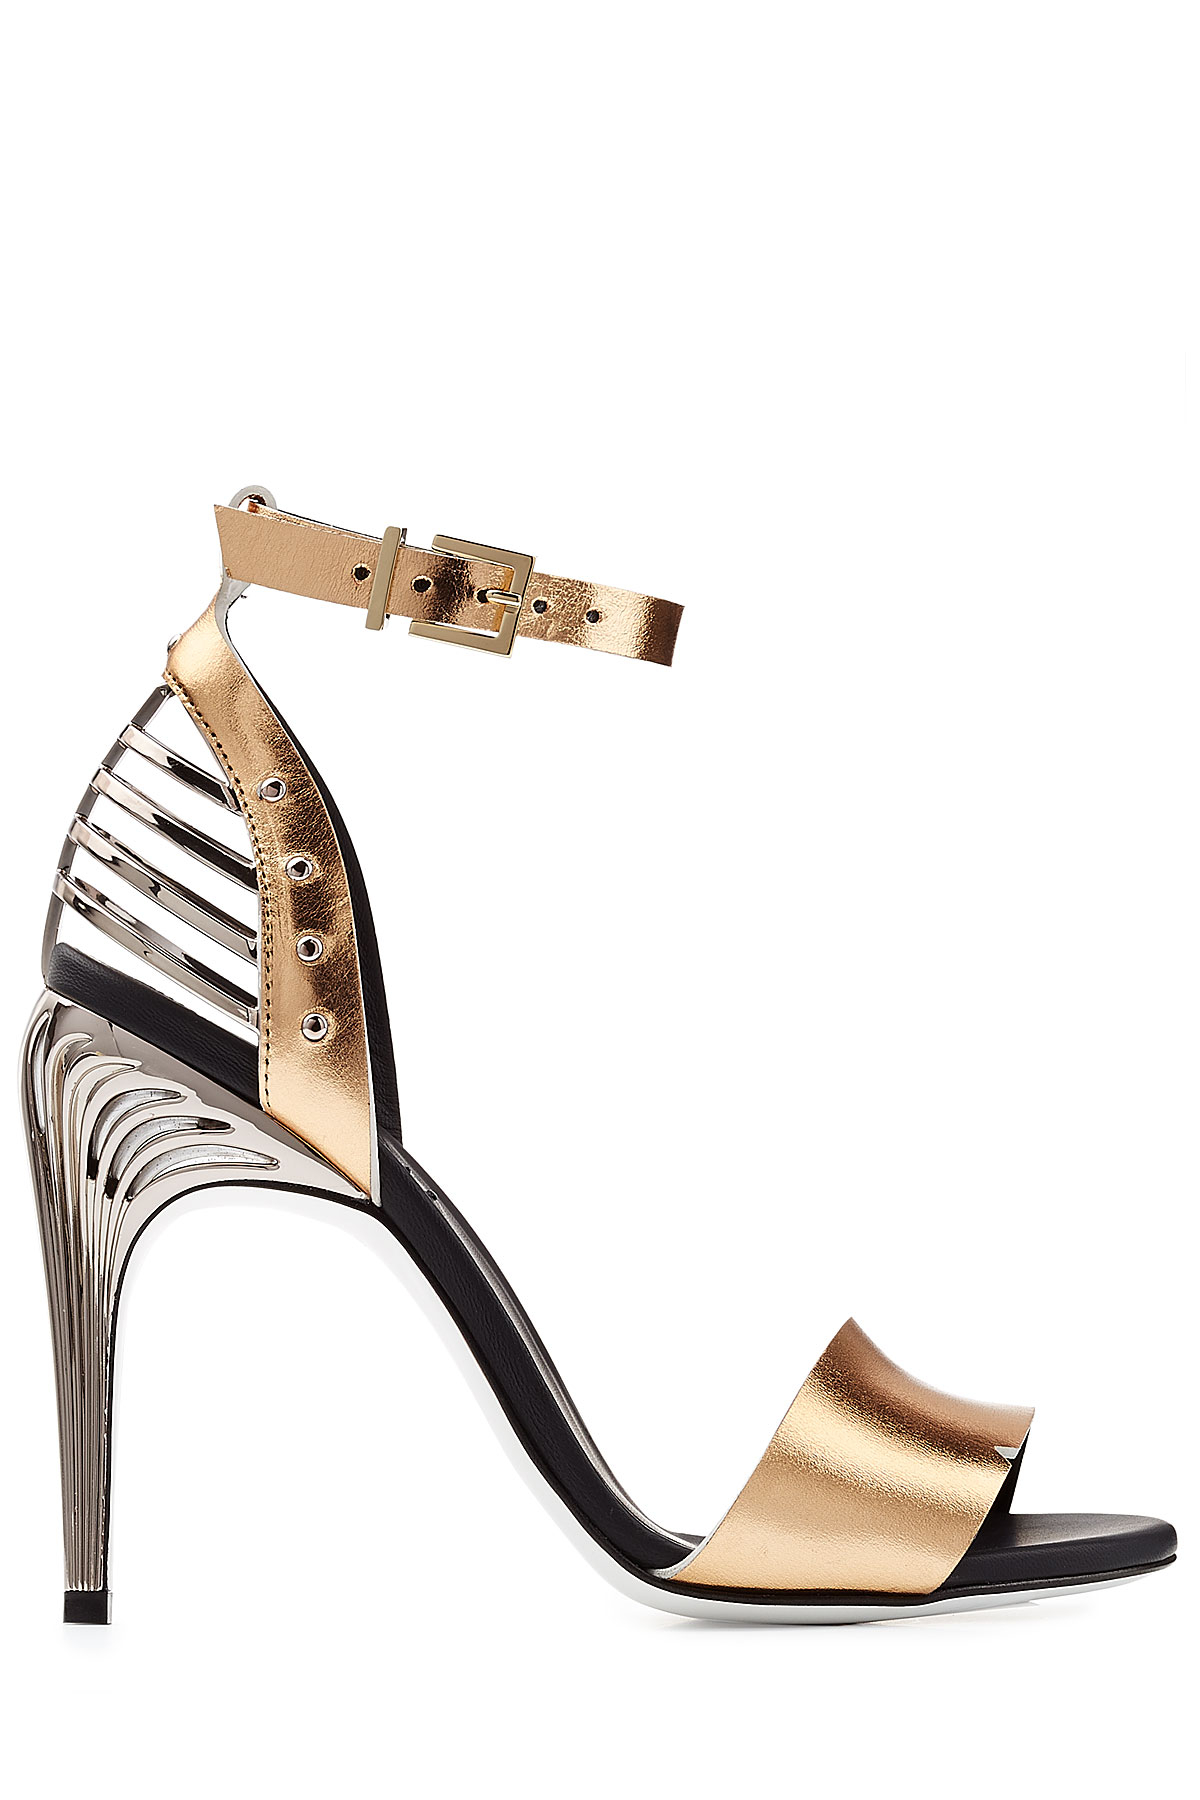 a96090336078fd Lyst - Fendi Metallic Leather Sandals - Gold in Metallic